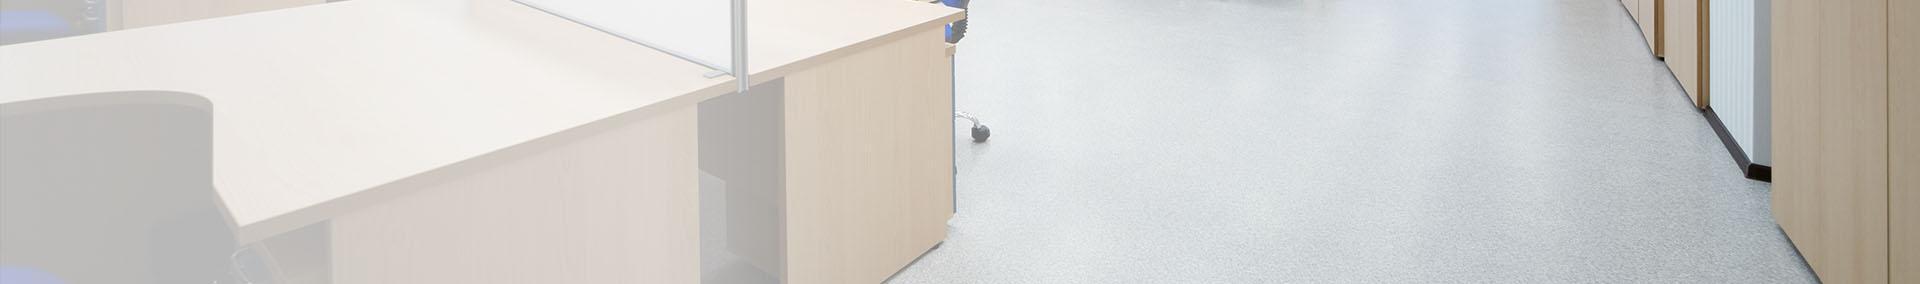 biurko na podłodze